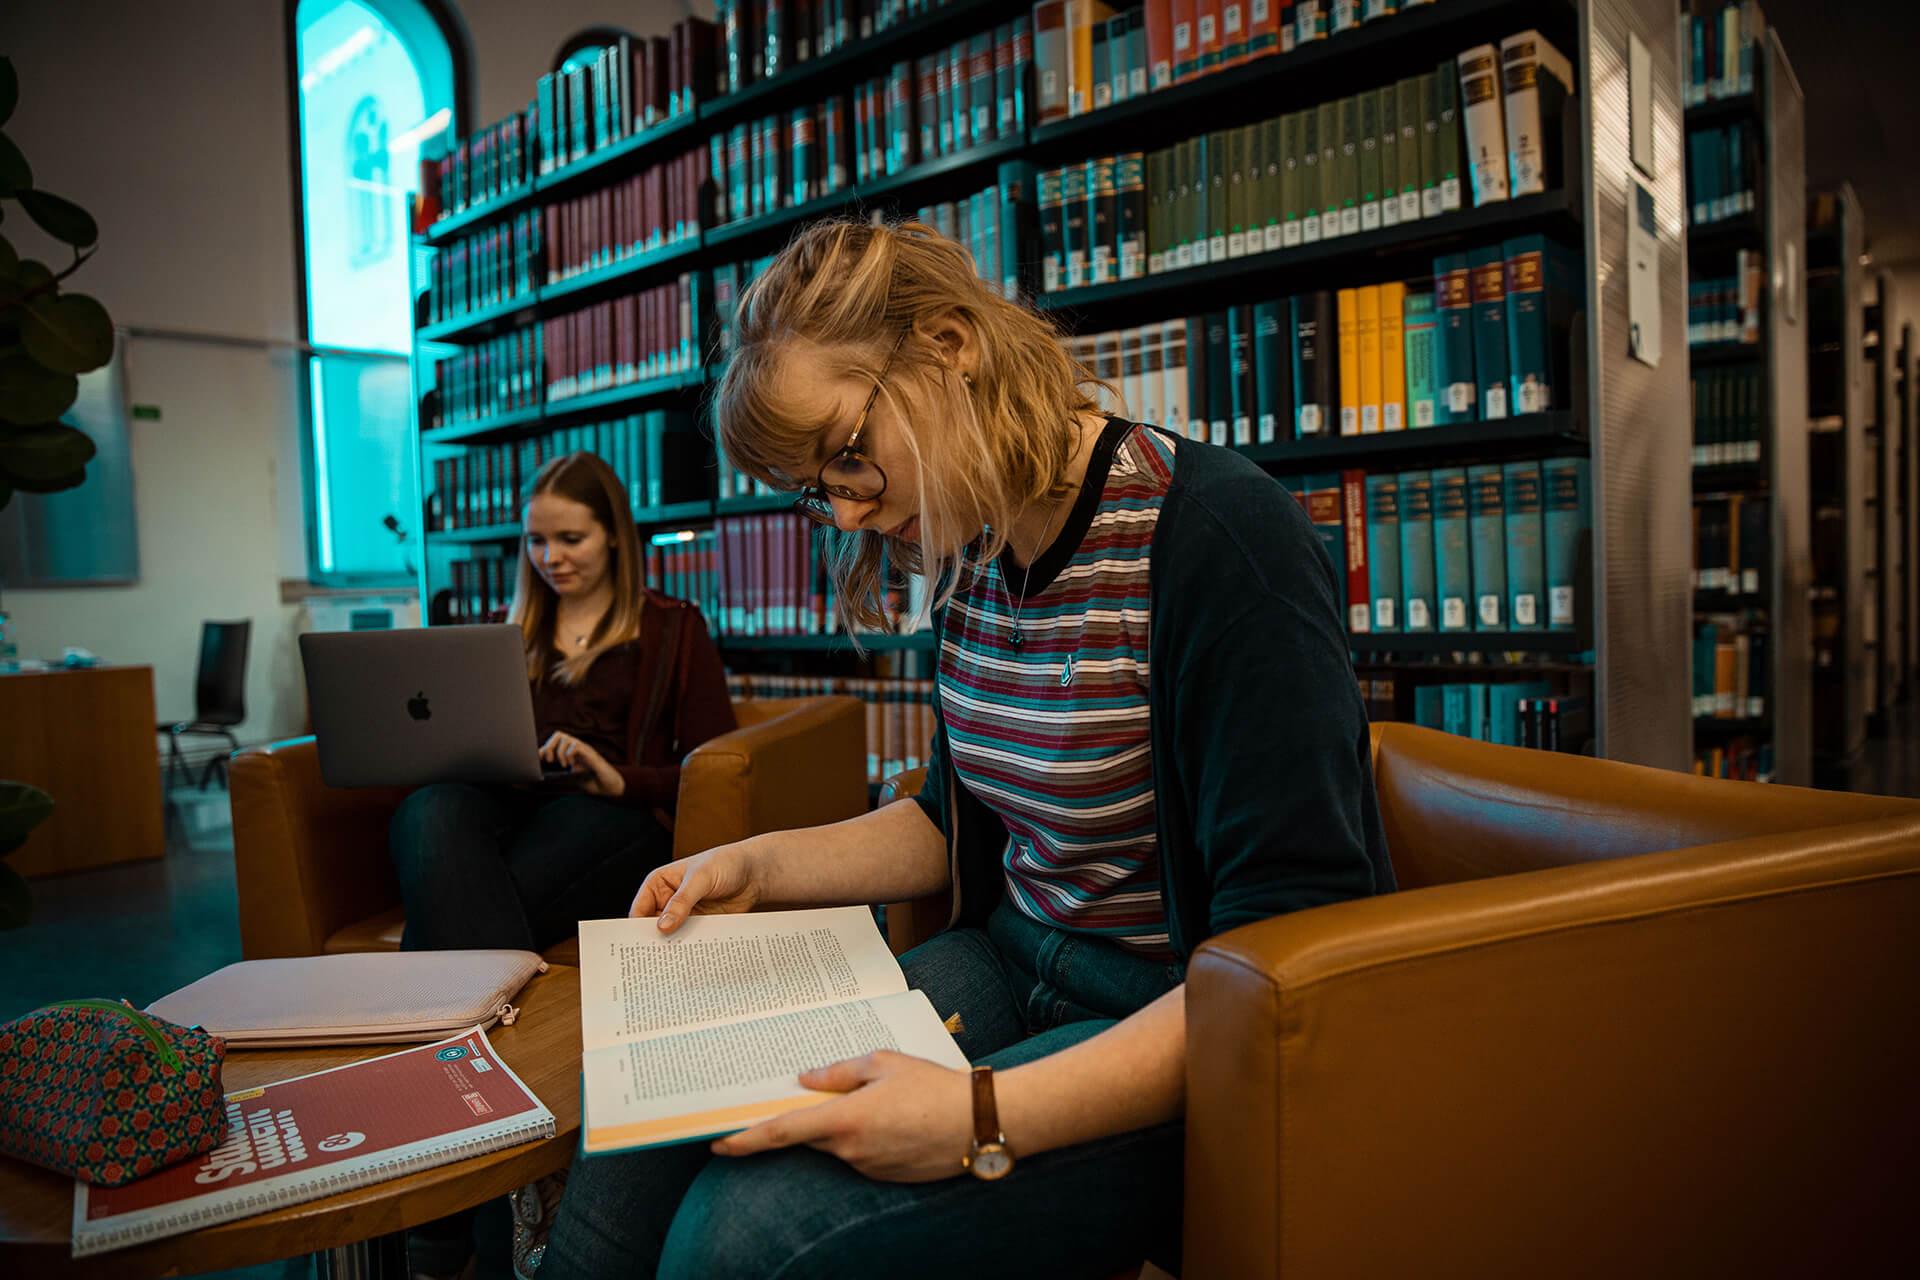 Studentinnen bei Lektüre in Bibliothek